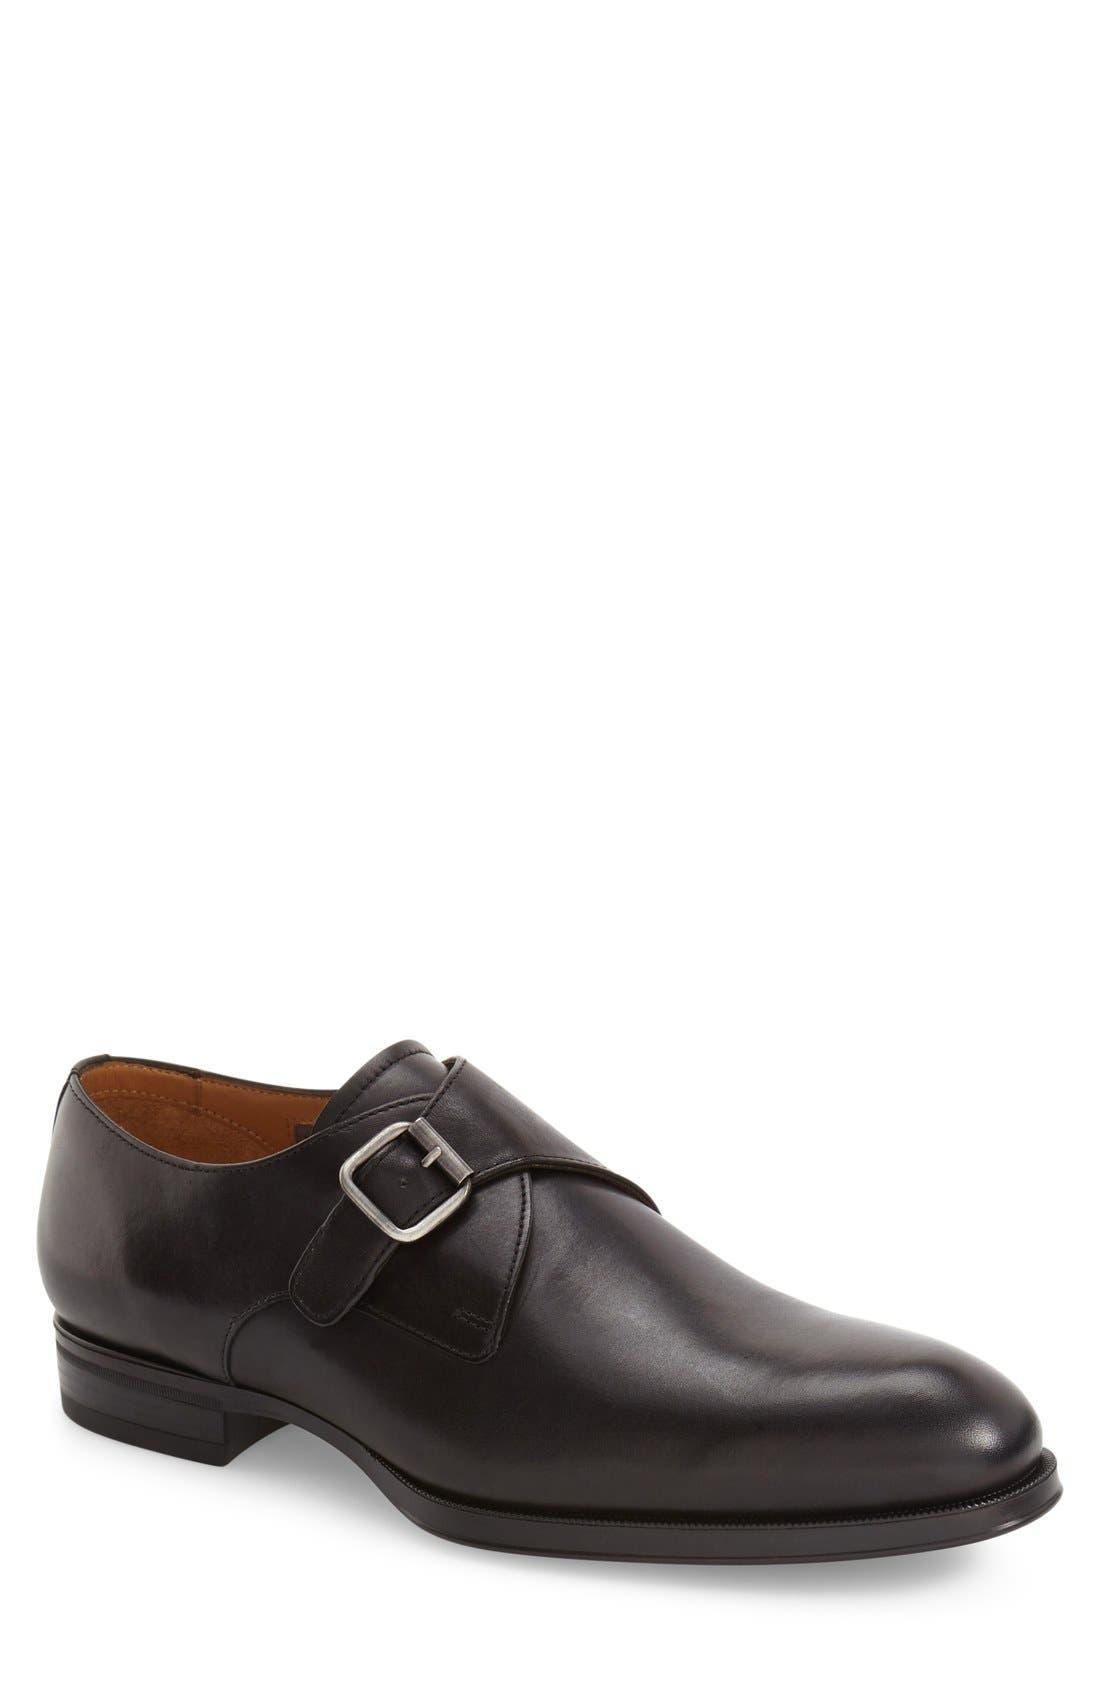 VINCE CAMUTO, 'Trifolo' Monk Strap Shoe, Main thumbnail 1, color, 001